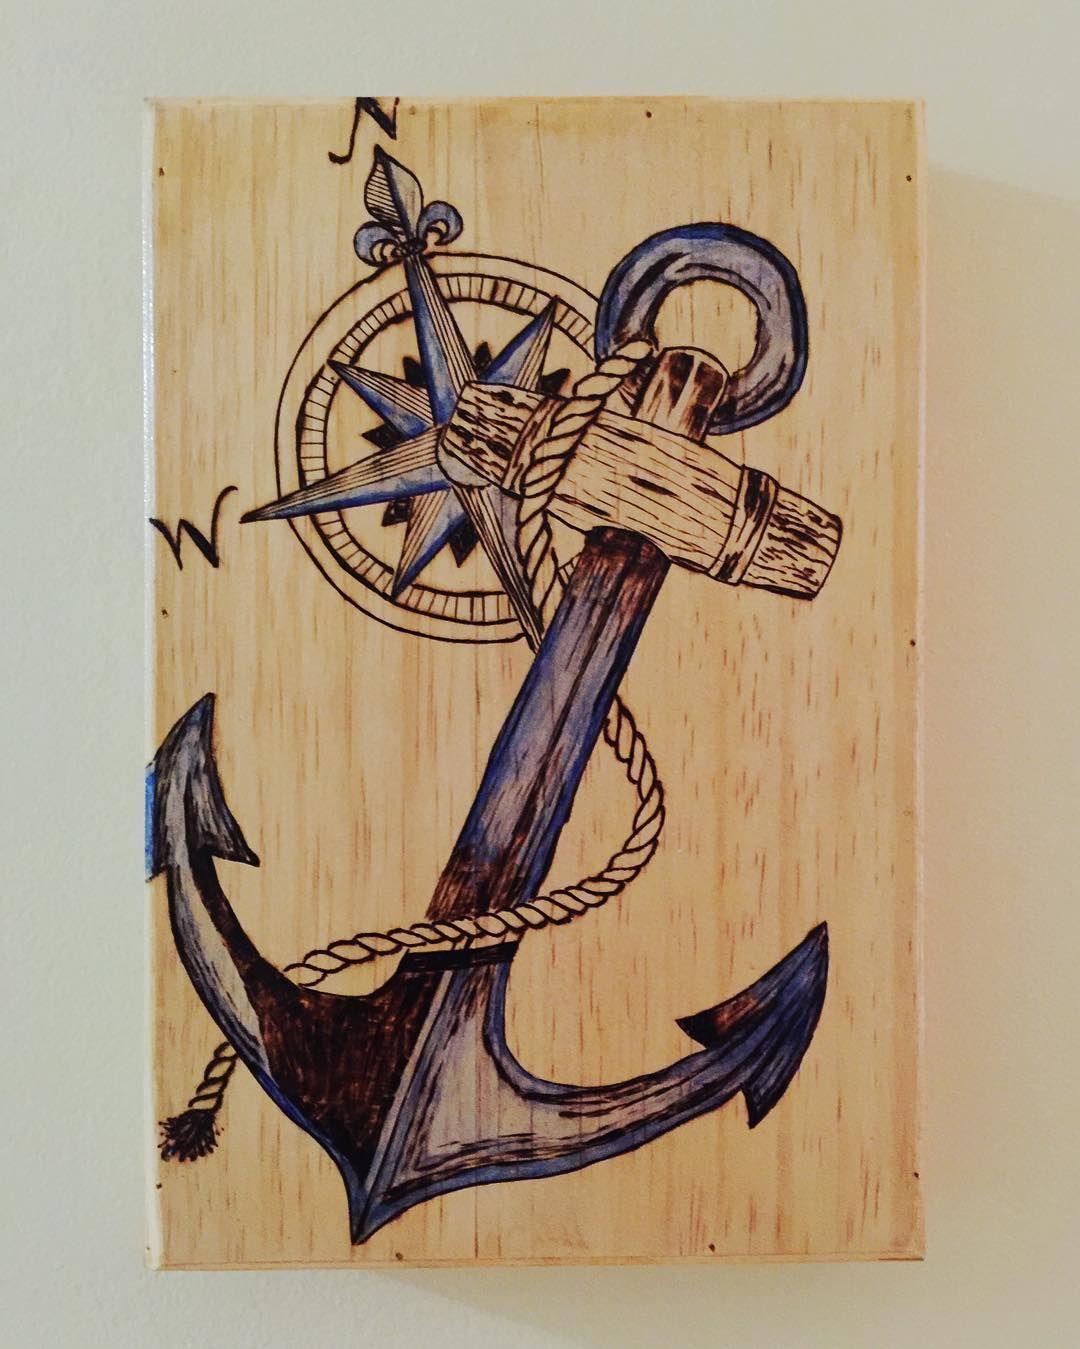 Jennyannecustoms Etsy Woodburning Pyrography Anchor Compass Nautical Wood Burning Patterns Stencil Wood Burning Art Wood Burning Crafts